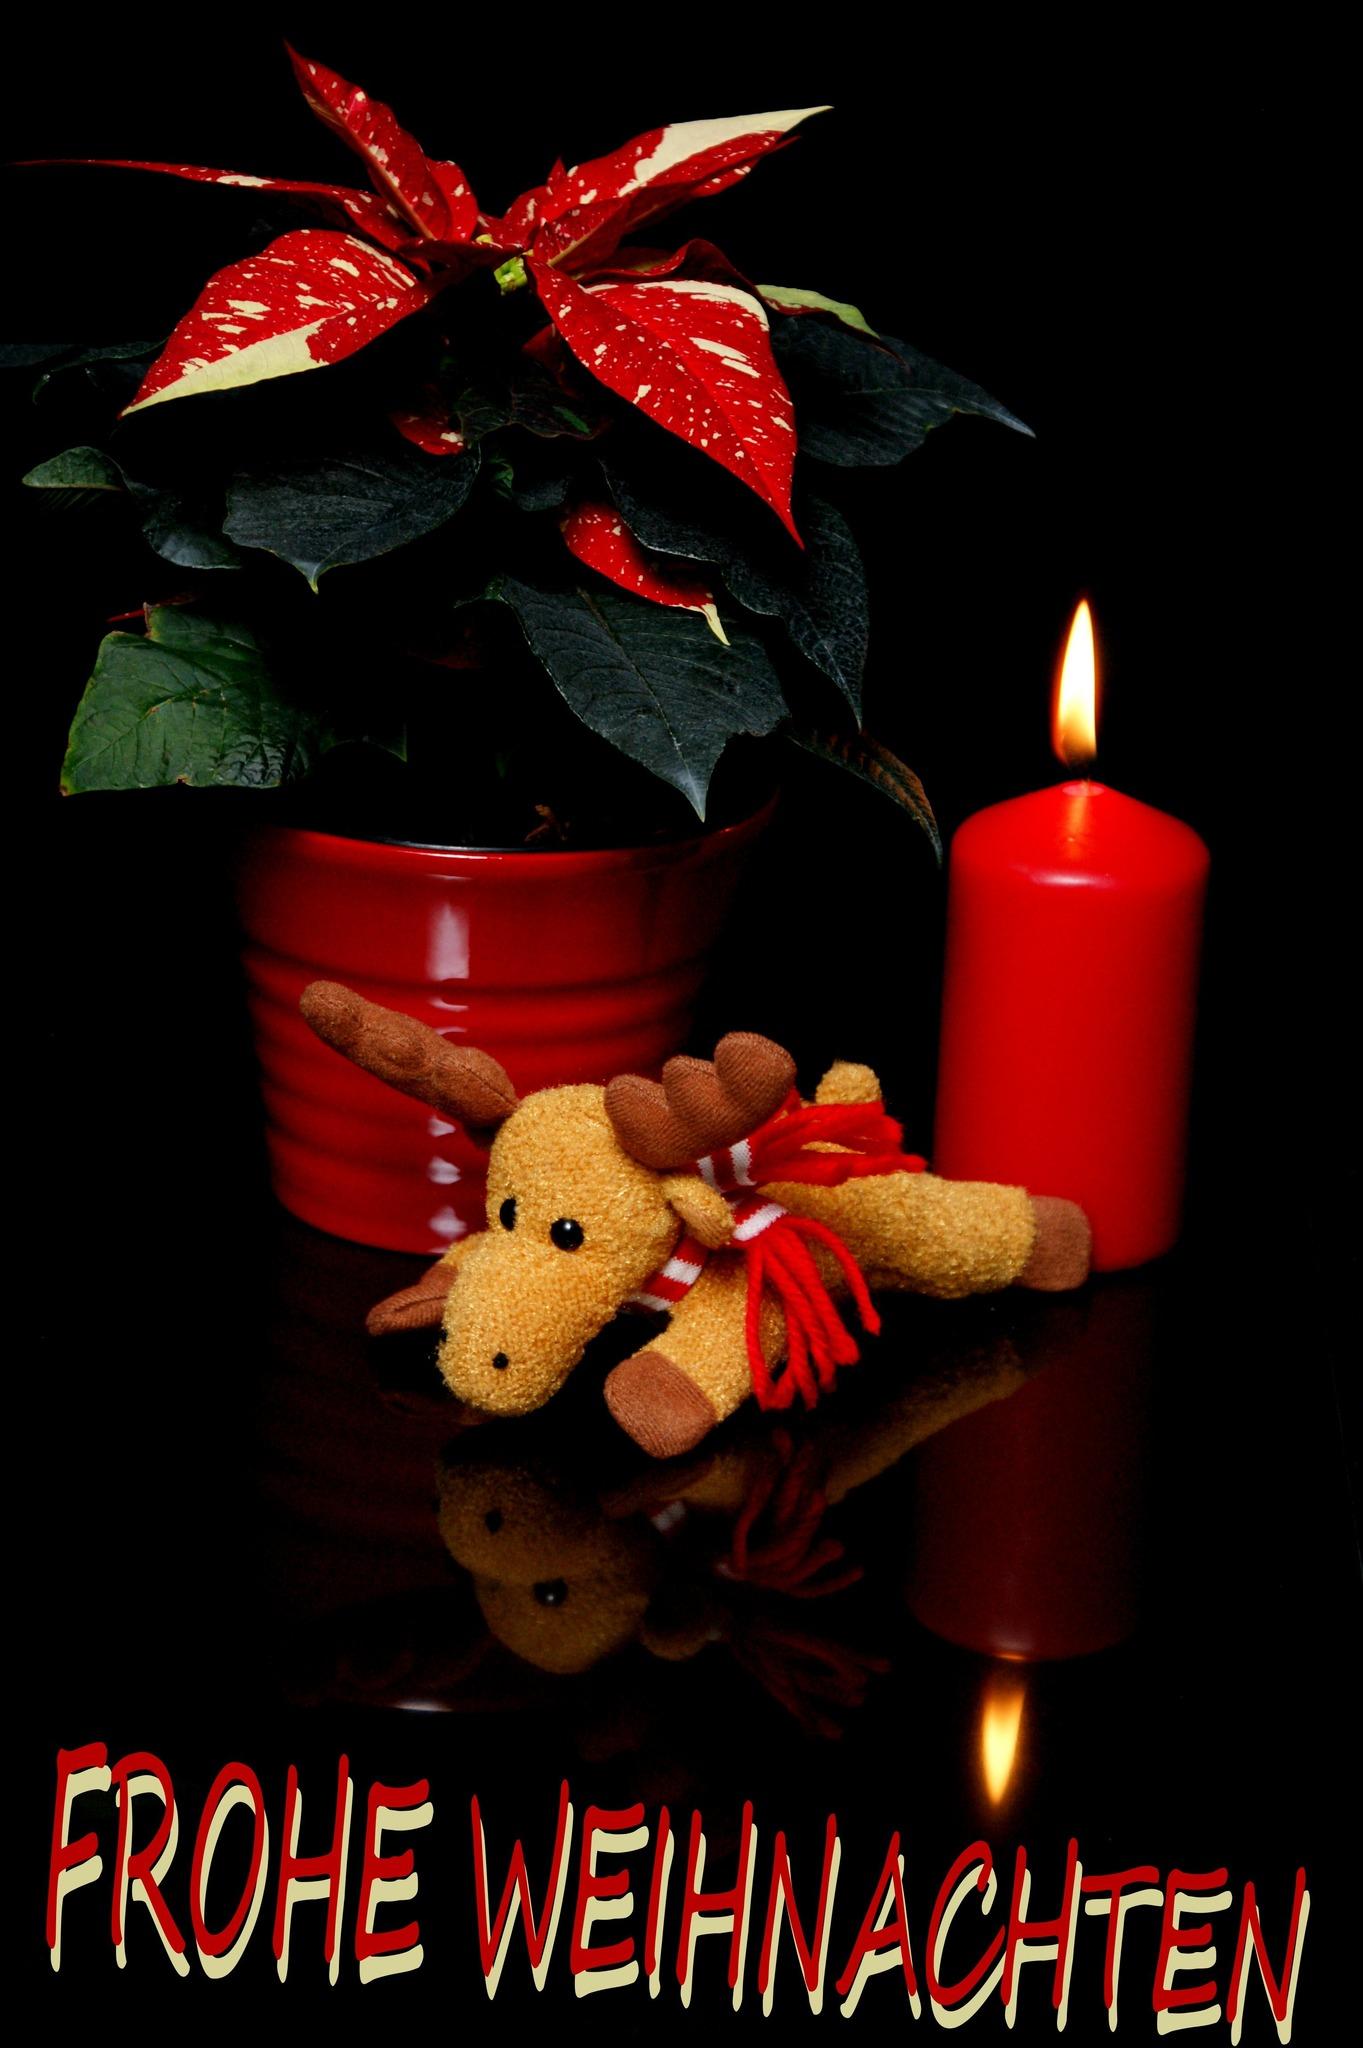 Wünsch Euch Allen Frohe Weihnachten.Wünsche Euch Allen Frohe Weihnachten Klagenfurt Land